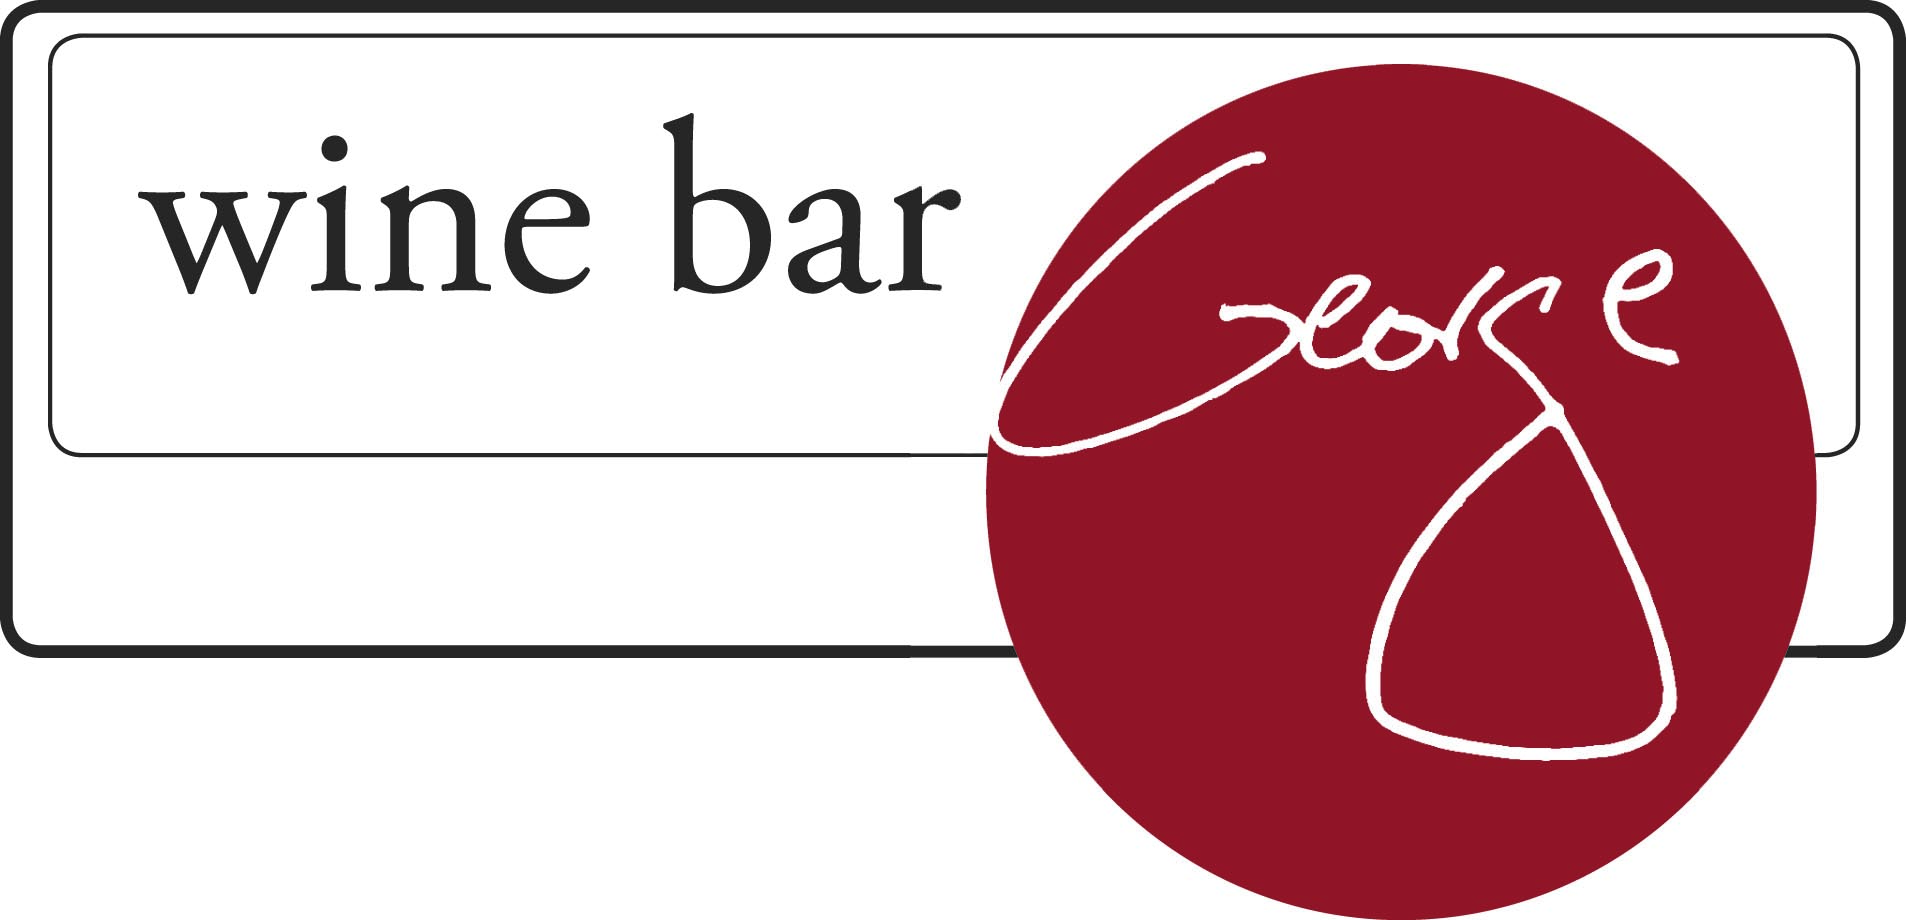 Wine Bar George Comes to Disney Springs